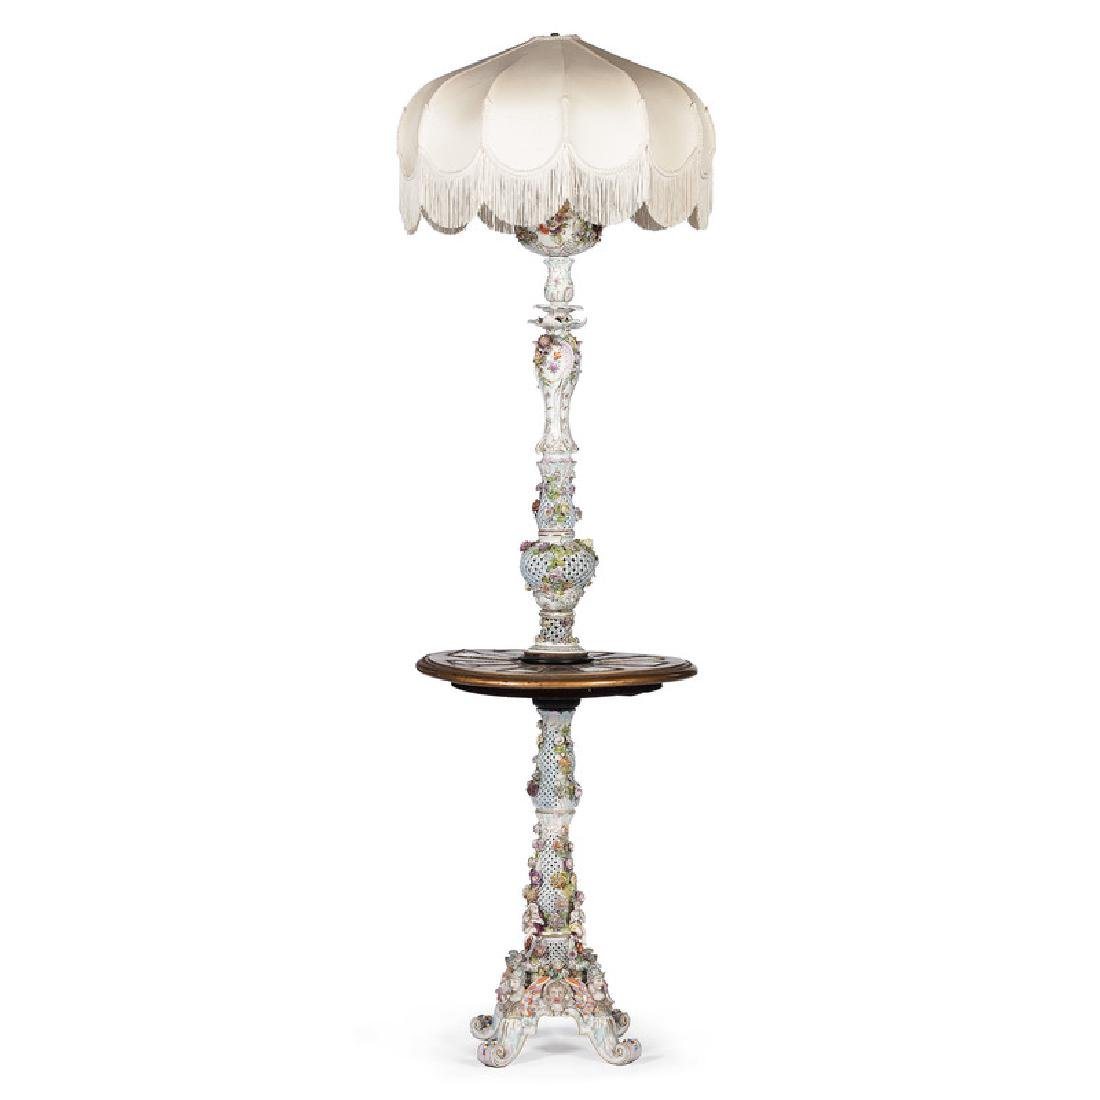 Carl Thieme Porcelain Floor Lamp